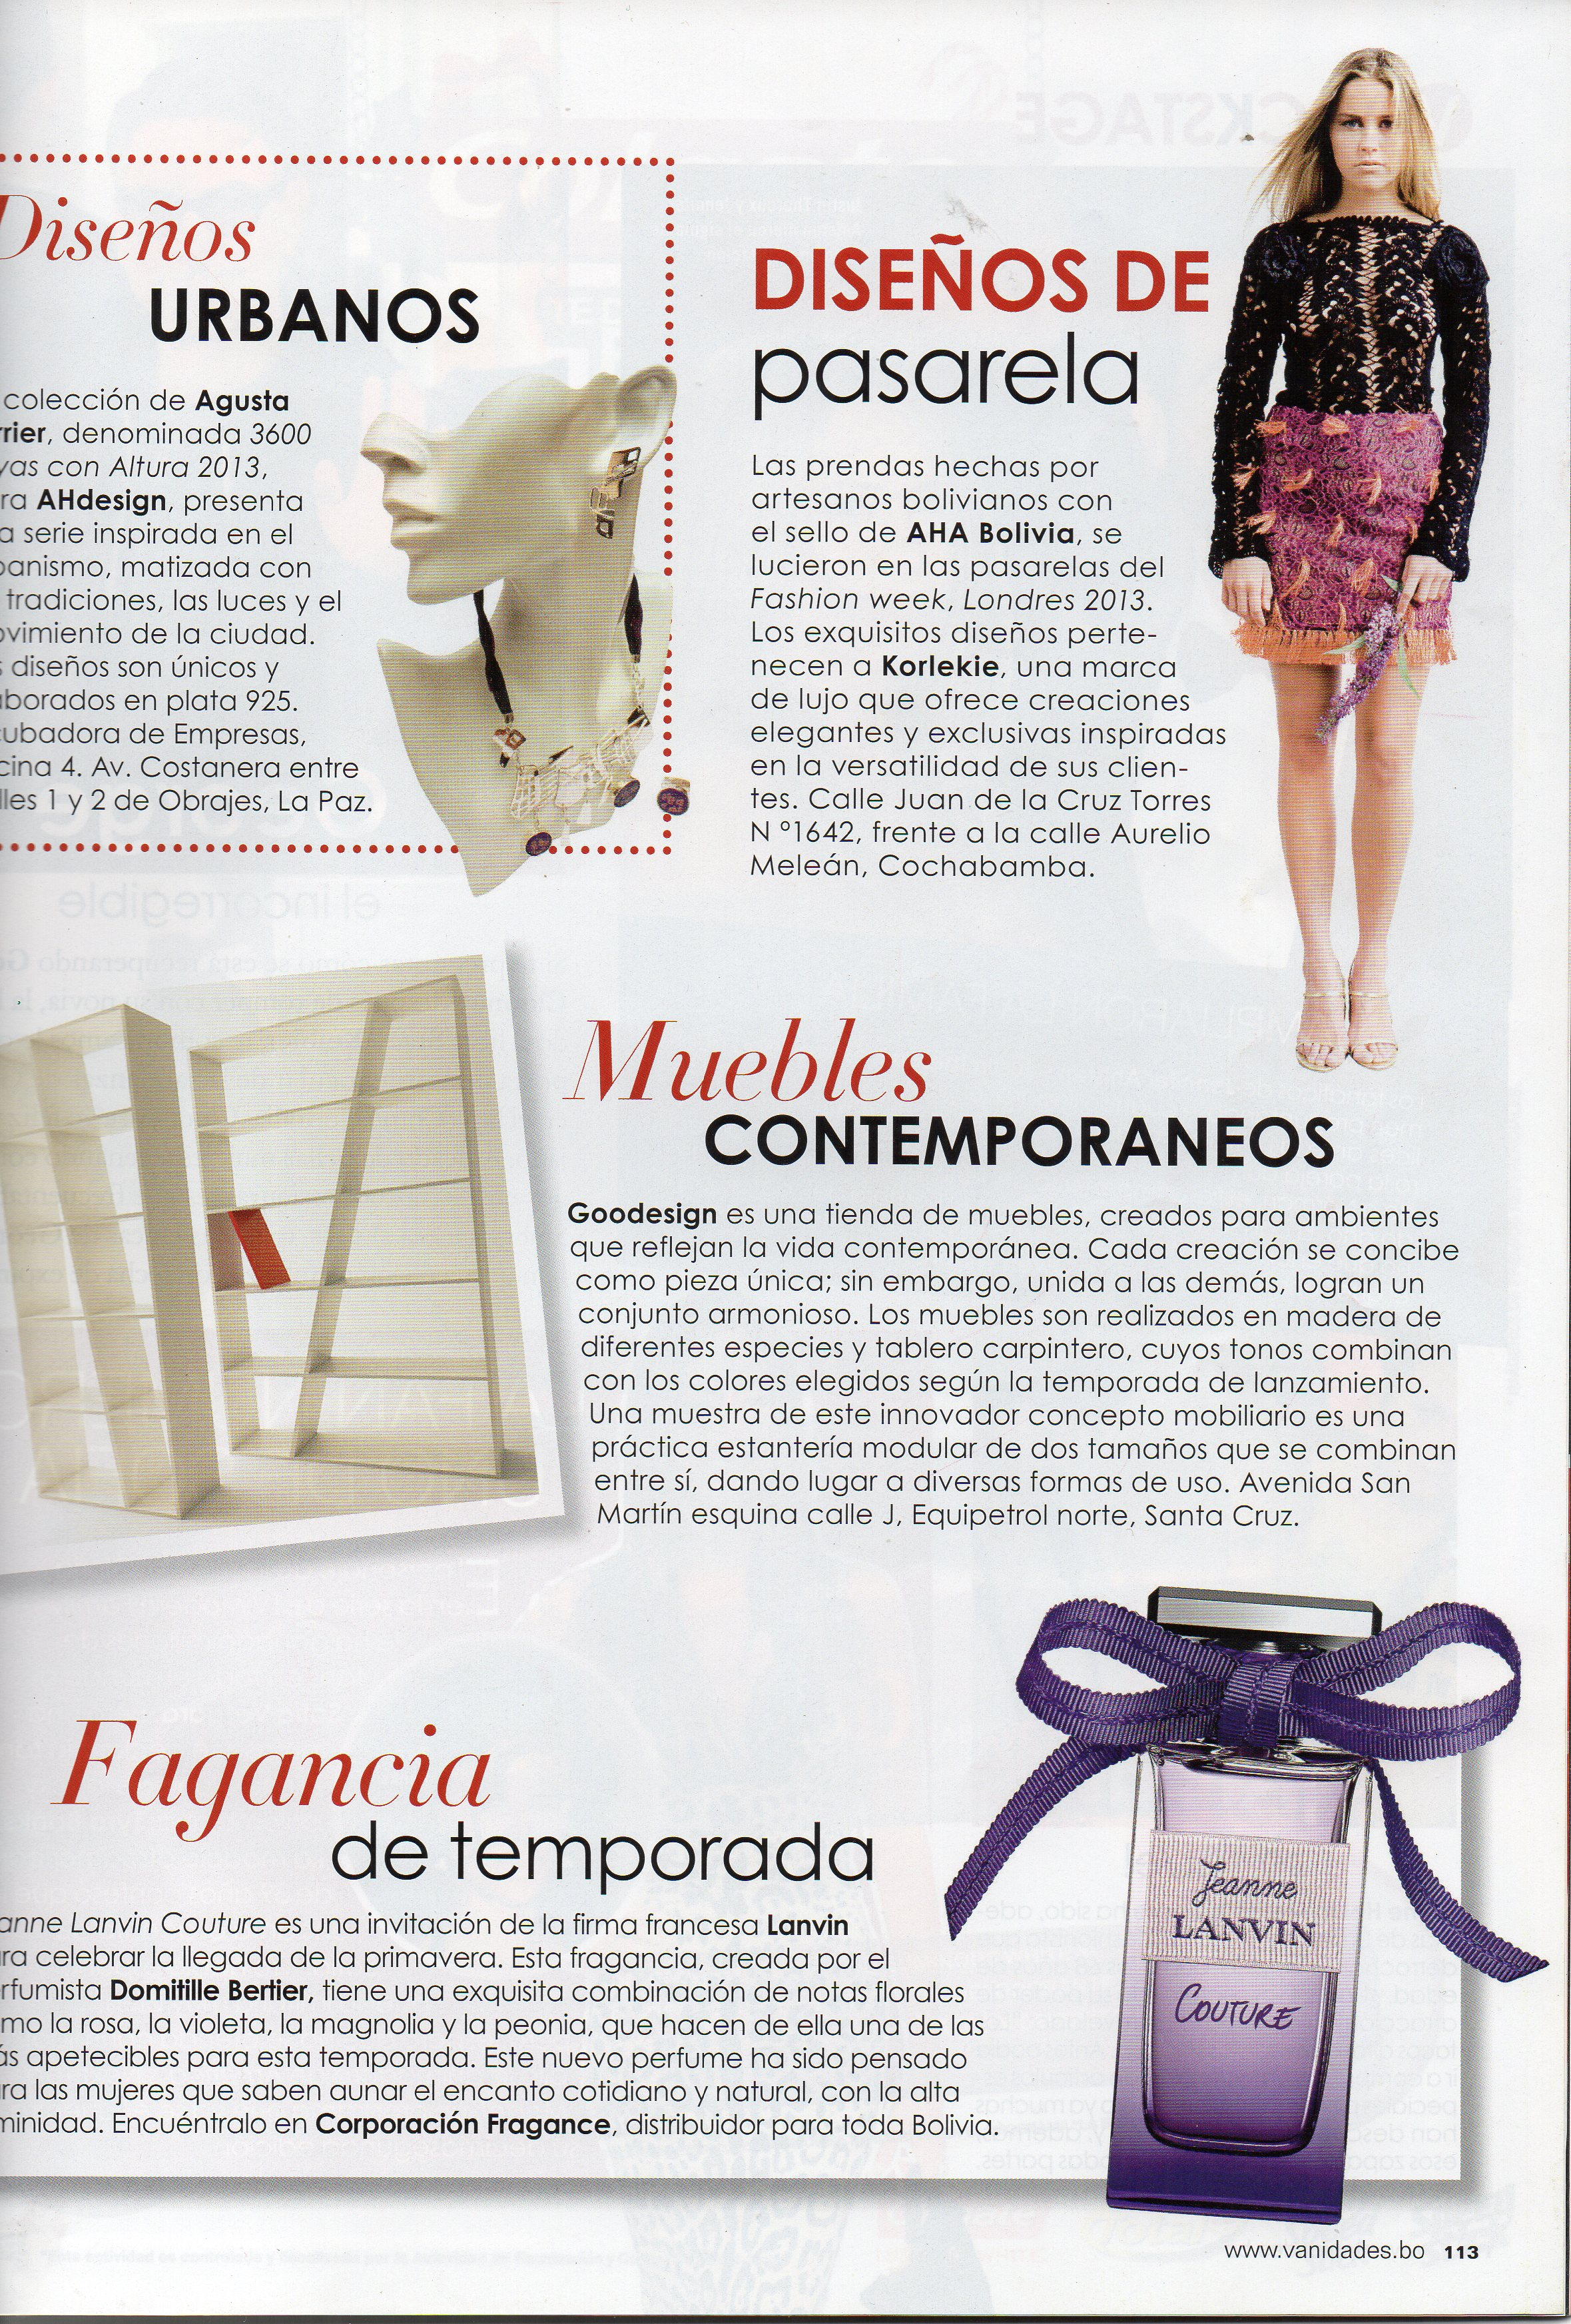 3 Aha Bolivia Korlekie # Muebles Fashion